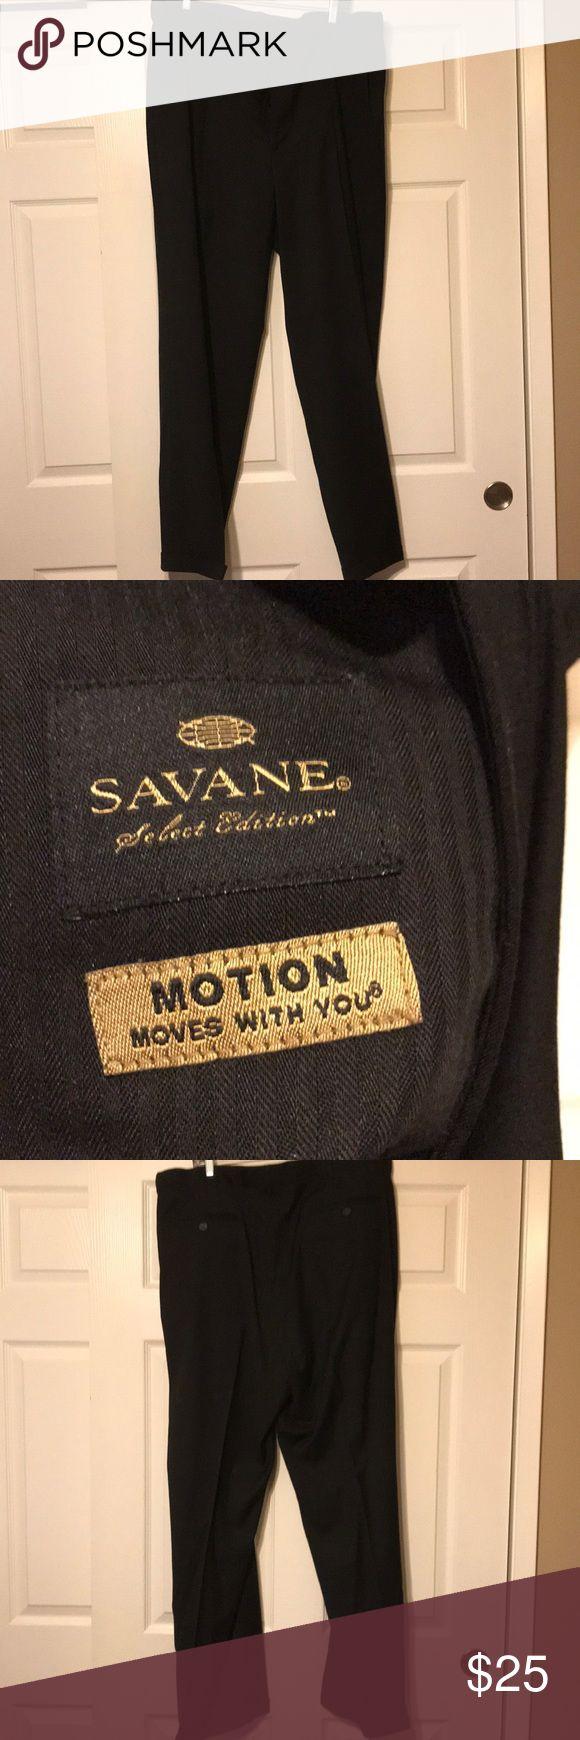 Savane slacks Savane select edition slacks. Pleated front   Hidden stretch waist band   Smoke free home   32 long Savane Pants Dress